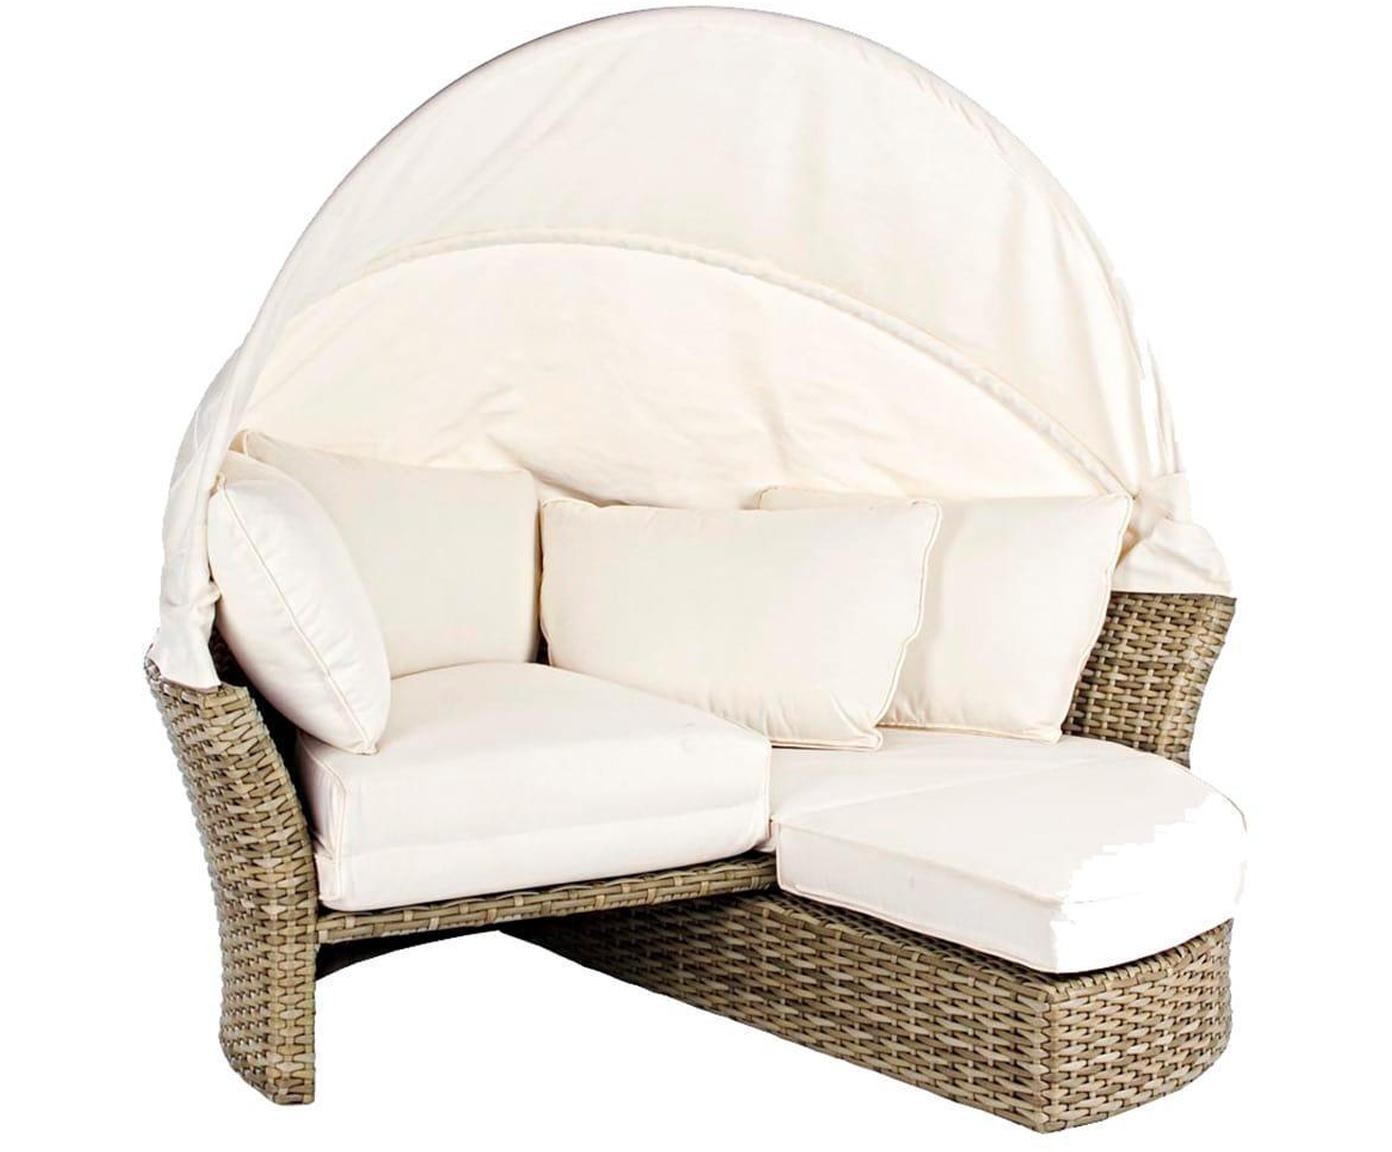 Sofá de exterior Lesly, Estructura: aluminio, polirratán, Blanco, beige, An 200 x Al 168 cm